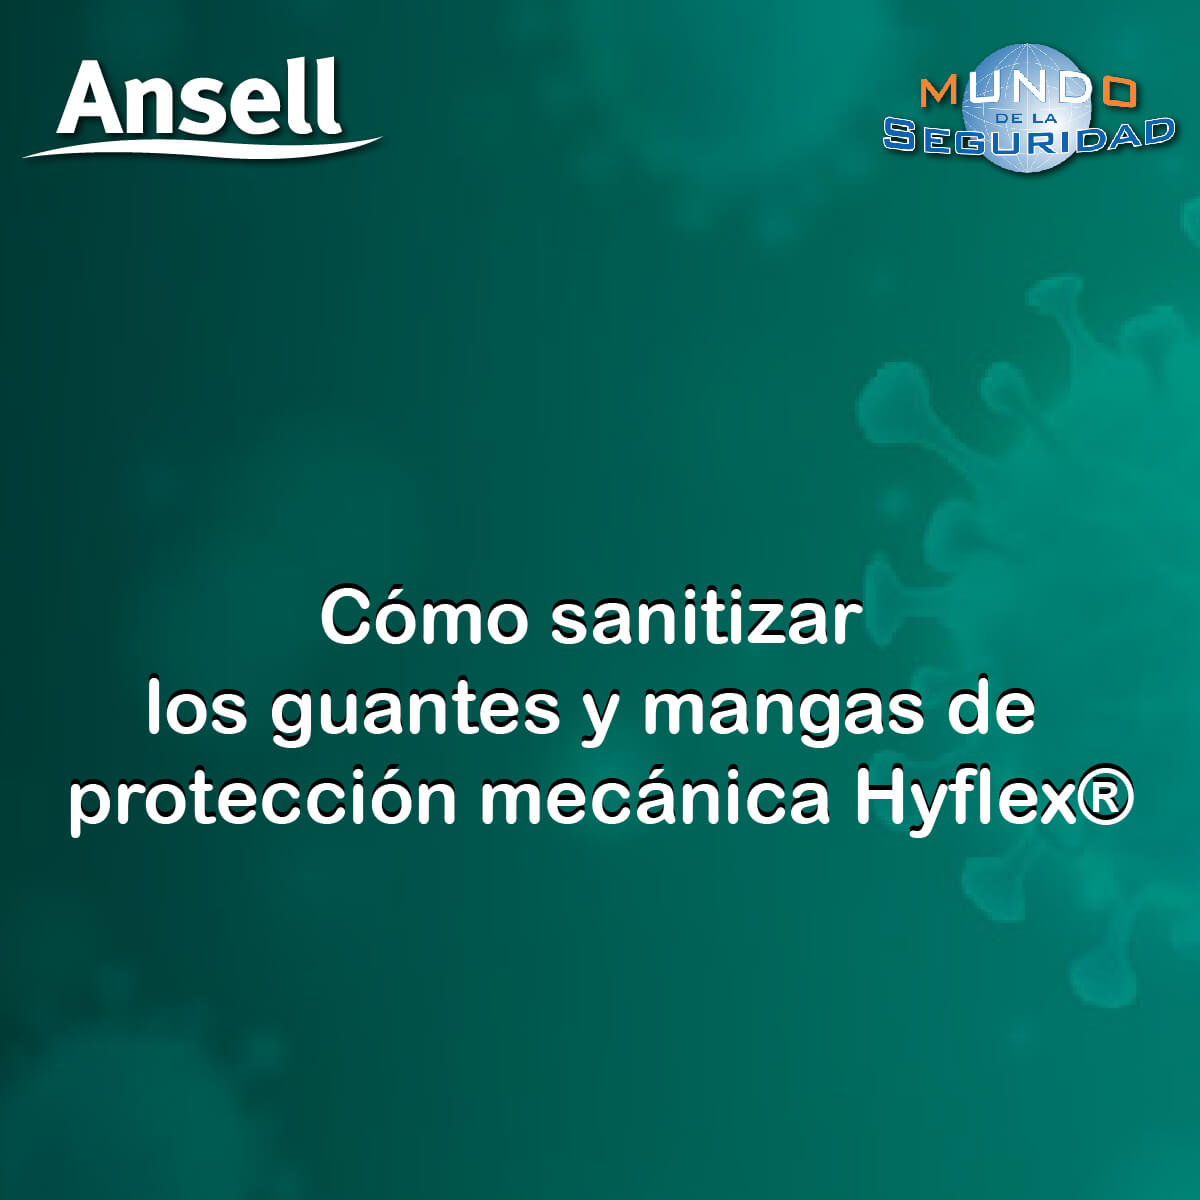 Sanitización de Guantes y Mangas Hyflex Ansell